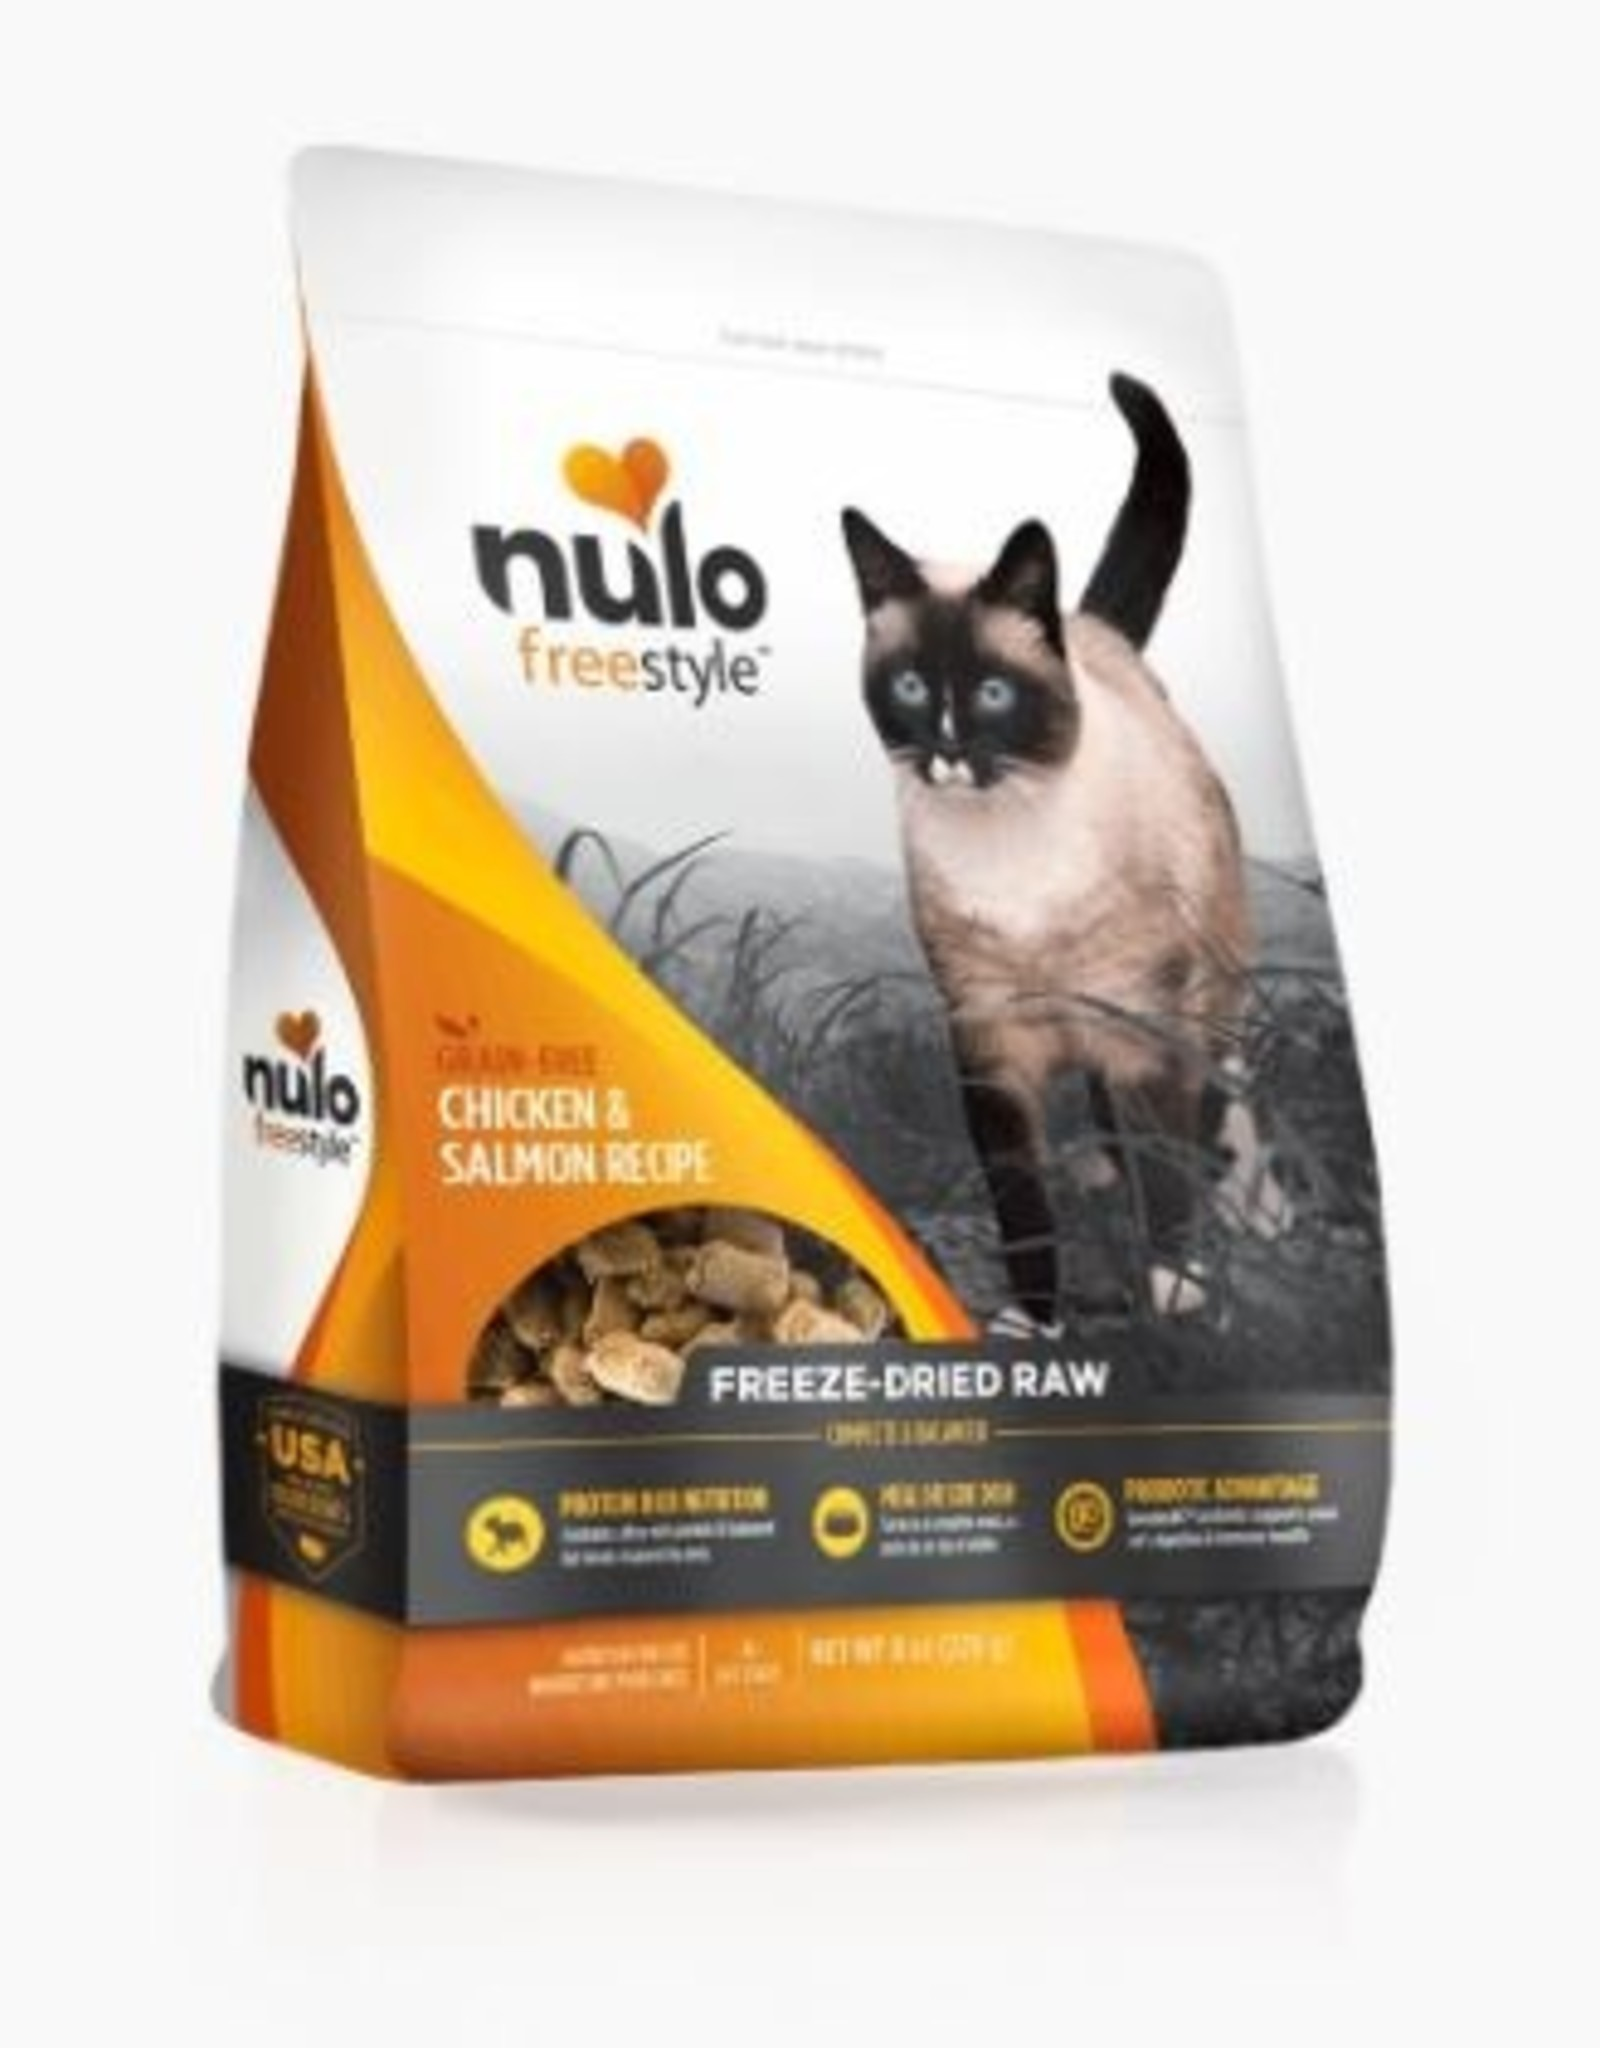 Nulo Freeze Dried Raw Grain Free Chicken & Salmon CAT Food 8 oz